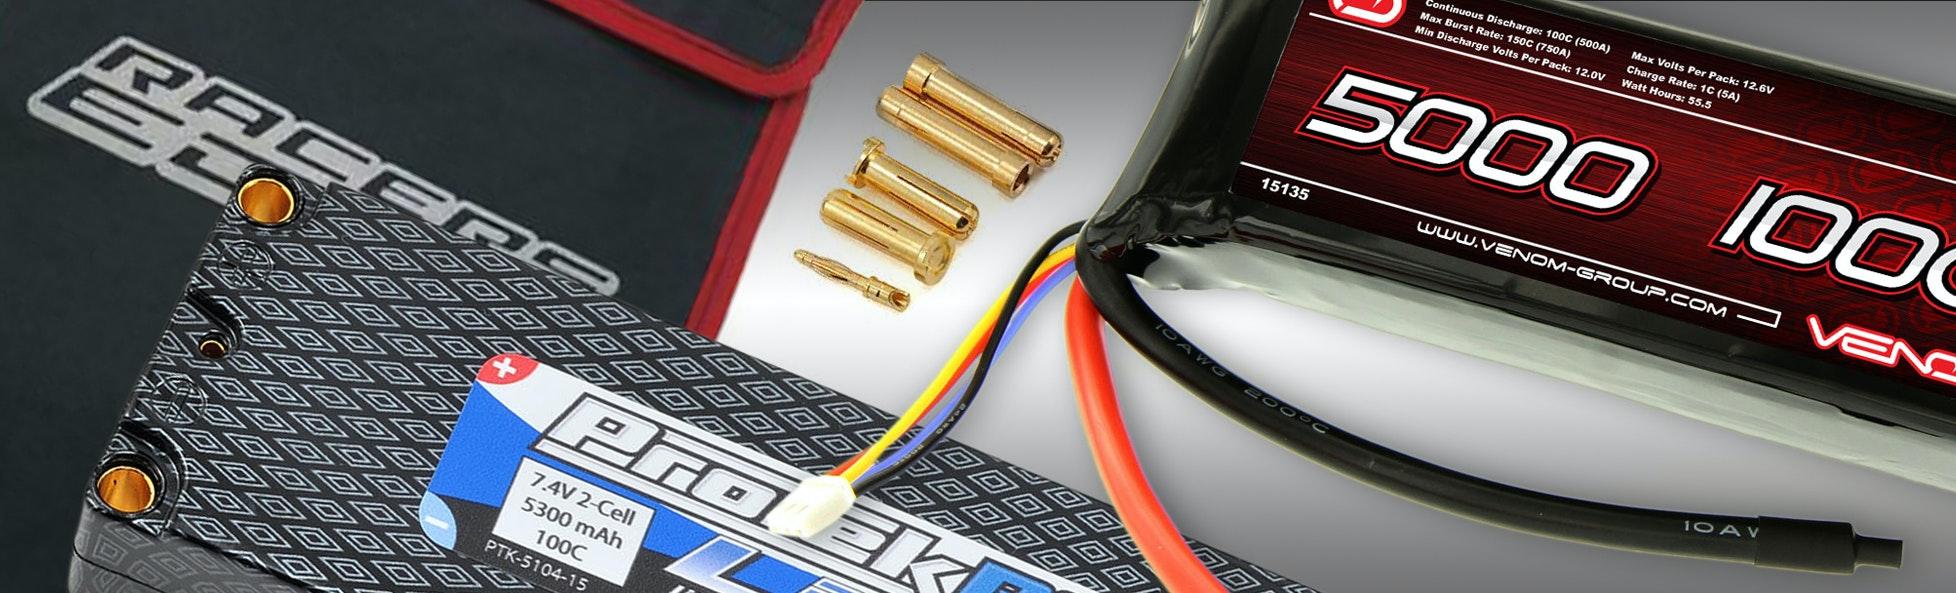 2S 100C Hard Case LiPo Battery Pack w/ LiPo Bag